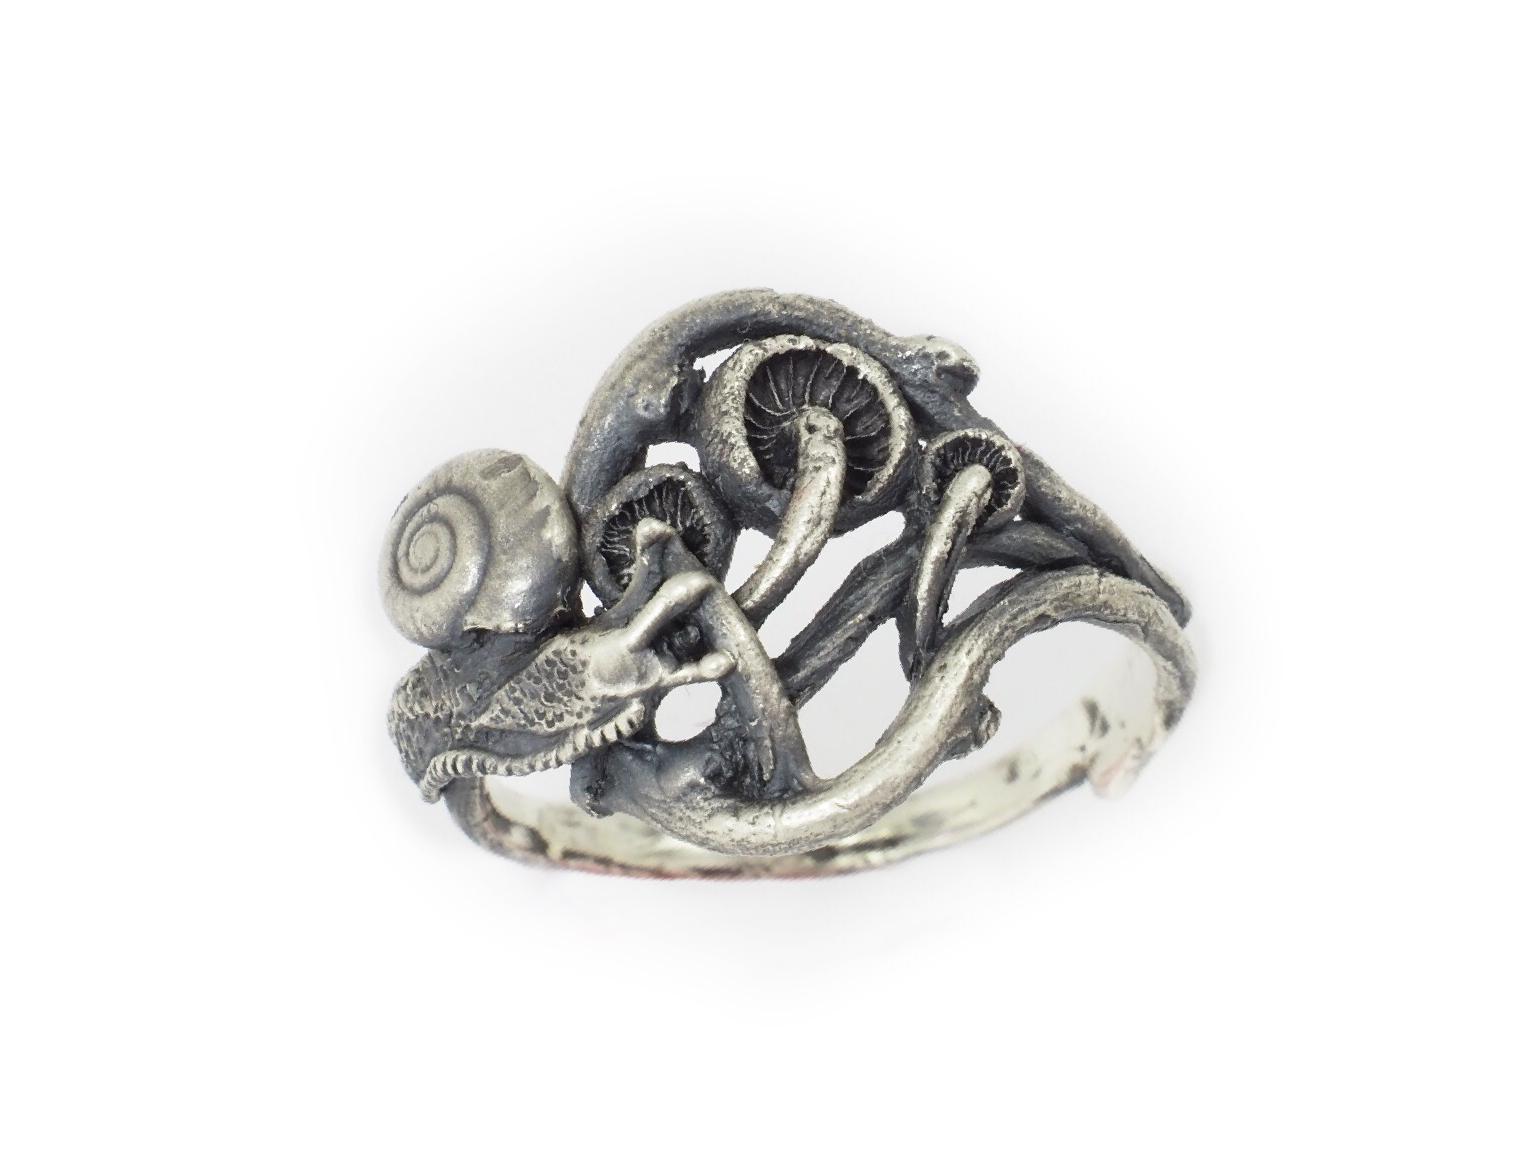 Mushroom Burrow Ring Snail